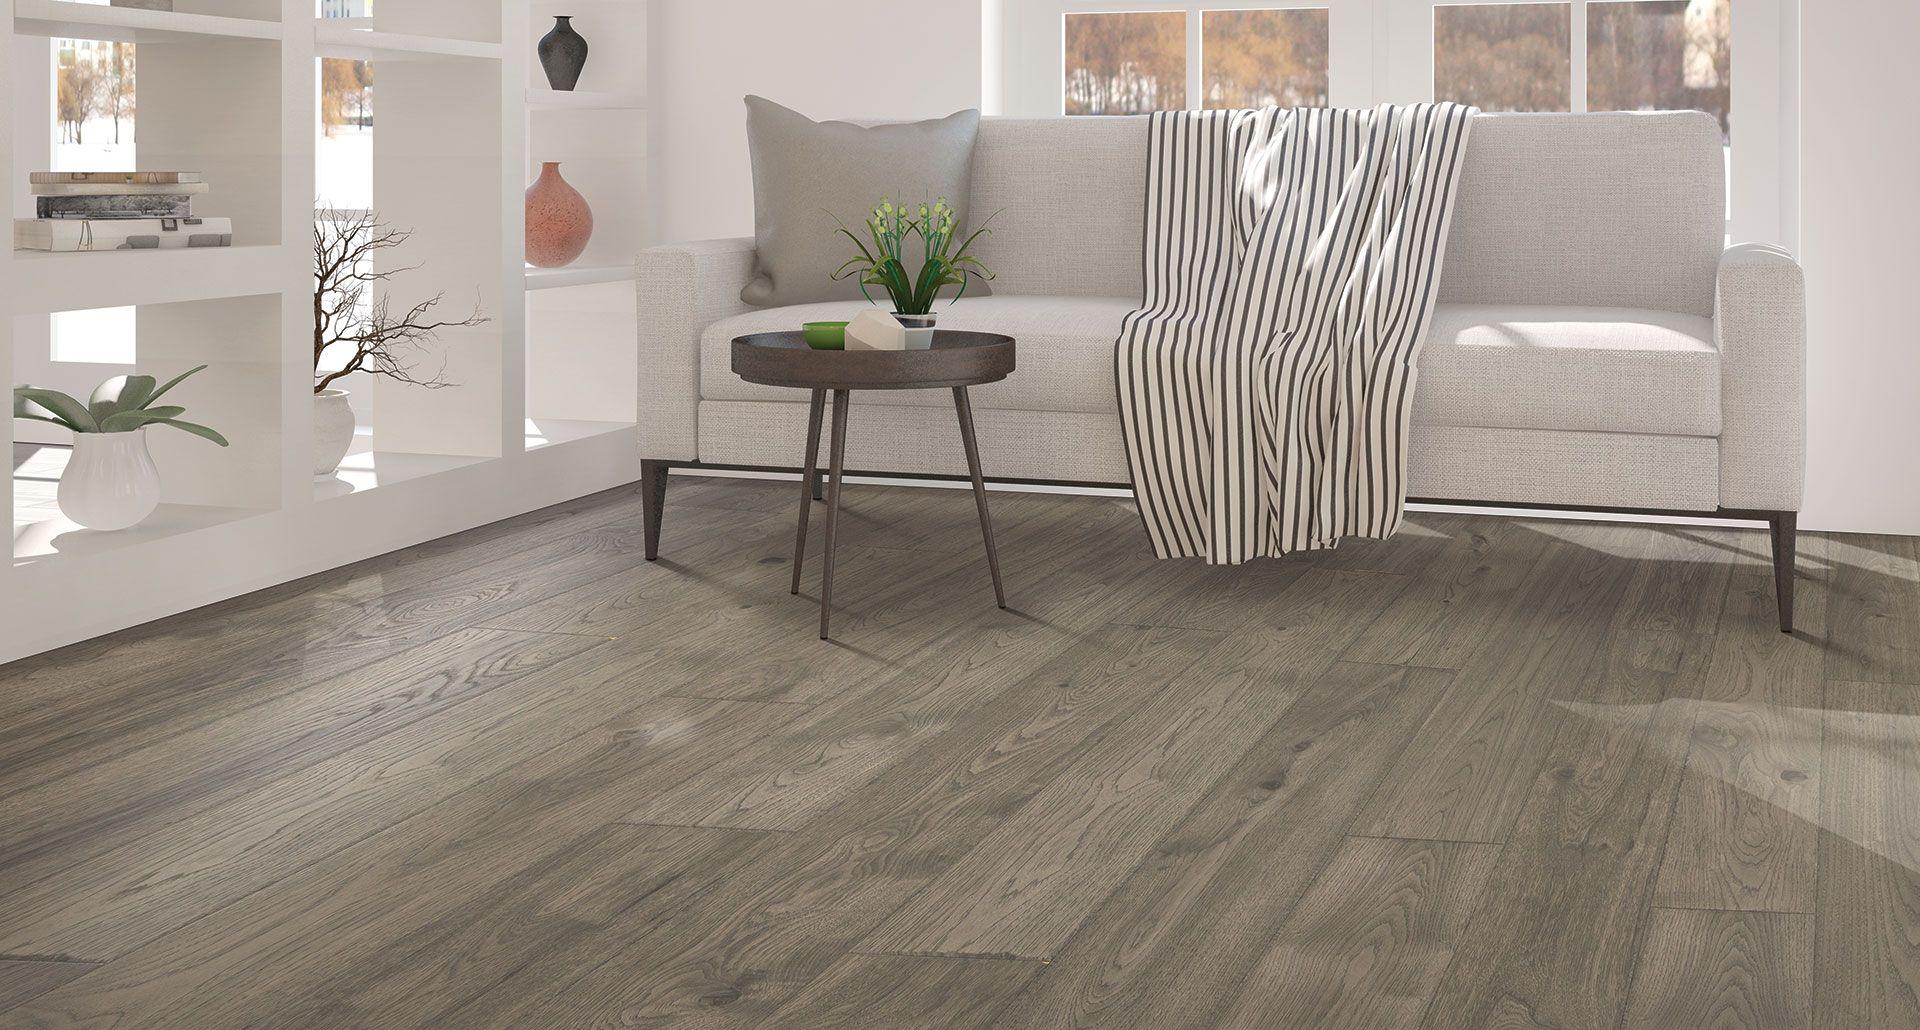 Anchor Grey Oak laminate floor. Natural wood look, 12mm